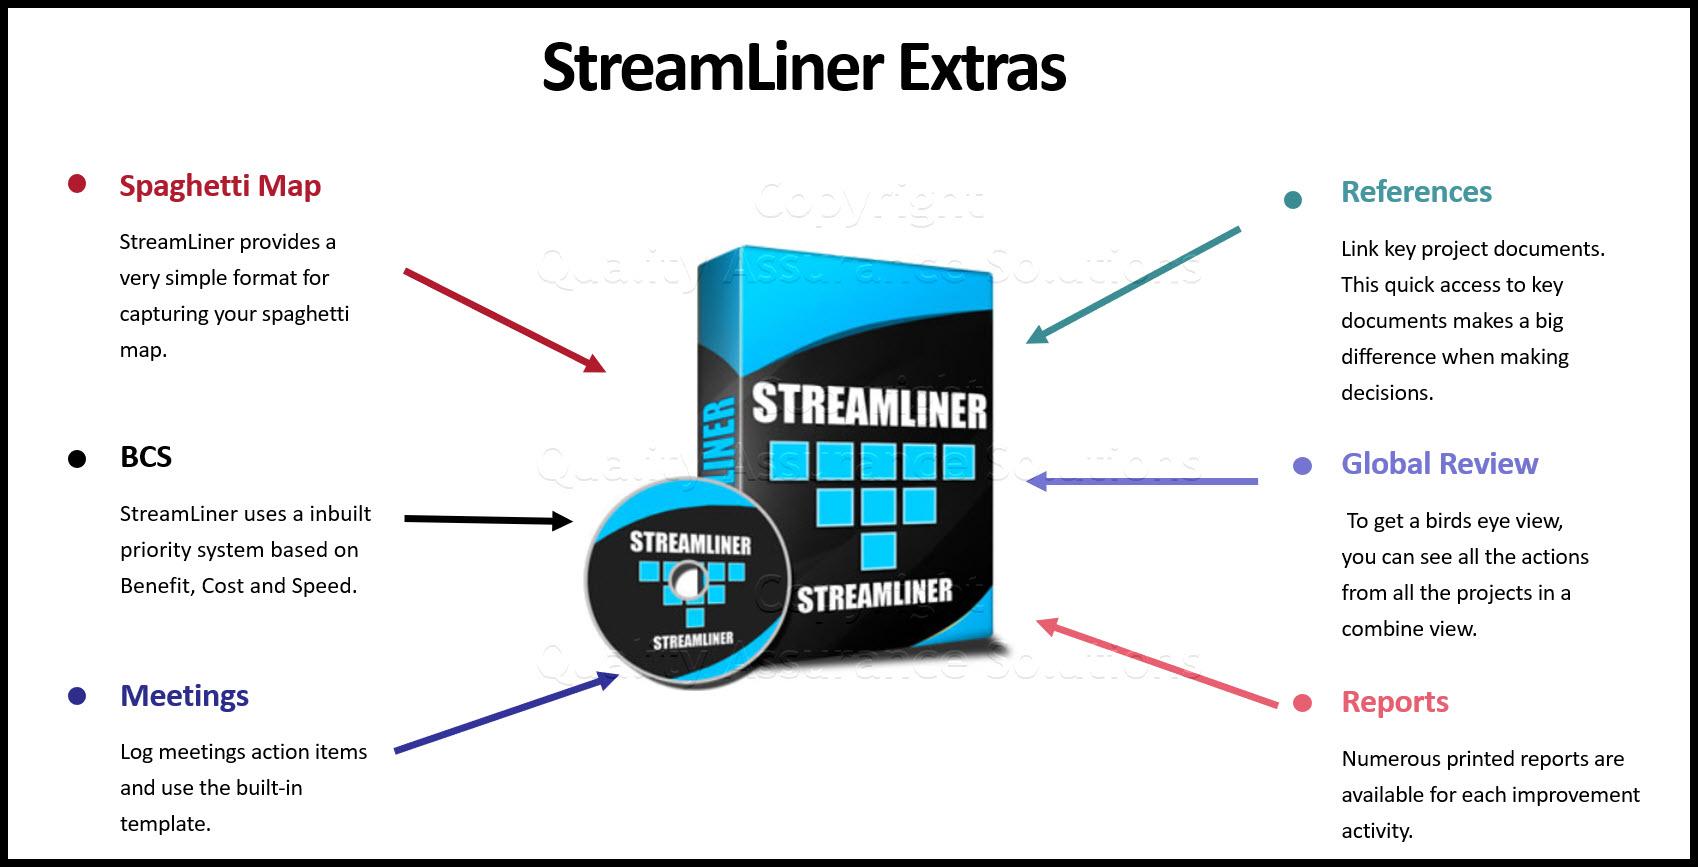 StreamLiner Extras business slide